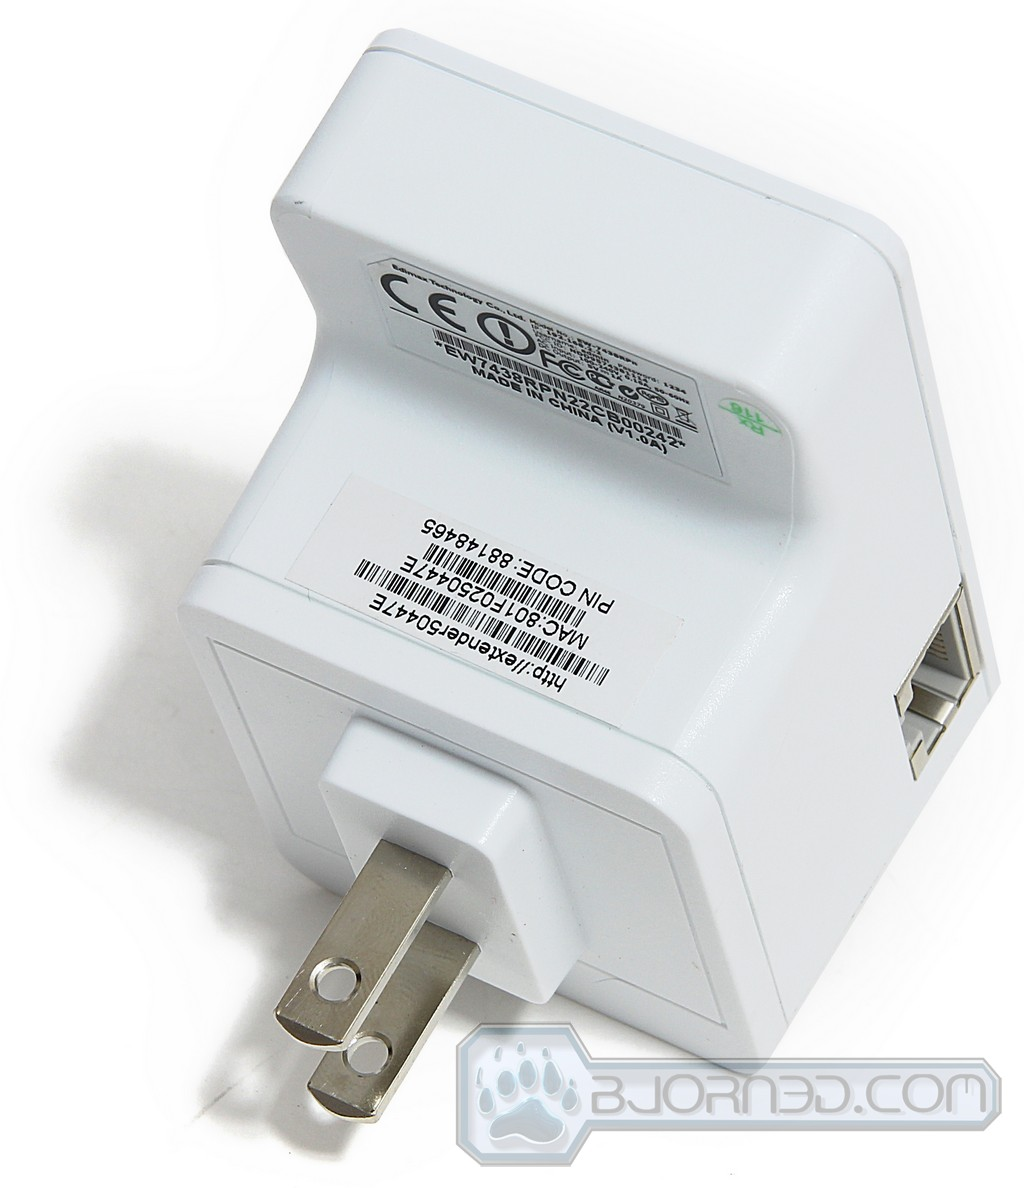 Edimax_N300_Universal_Wi-Fi-Extender-EW-7438RPn_10